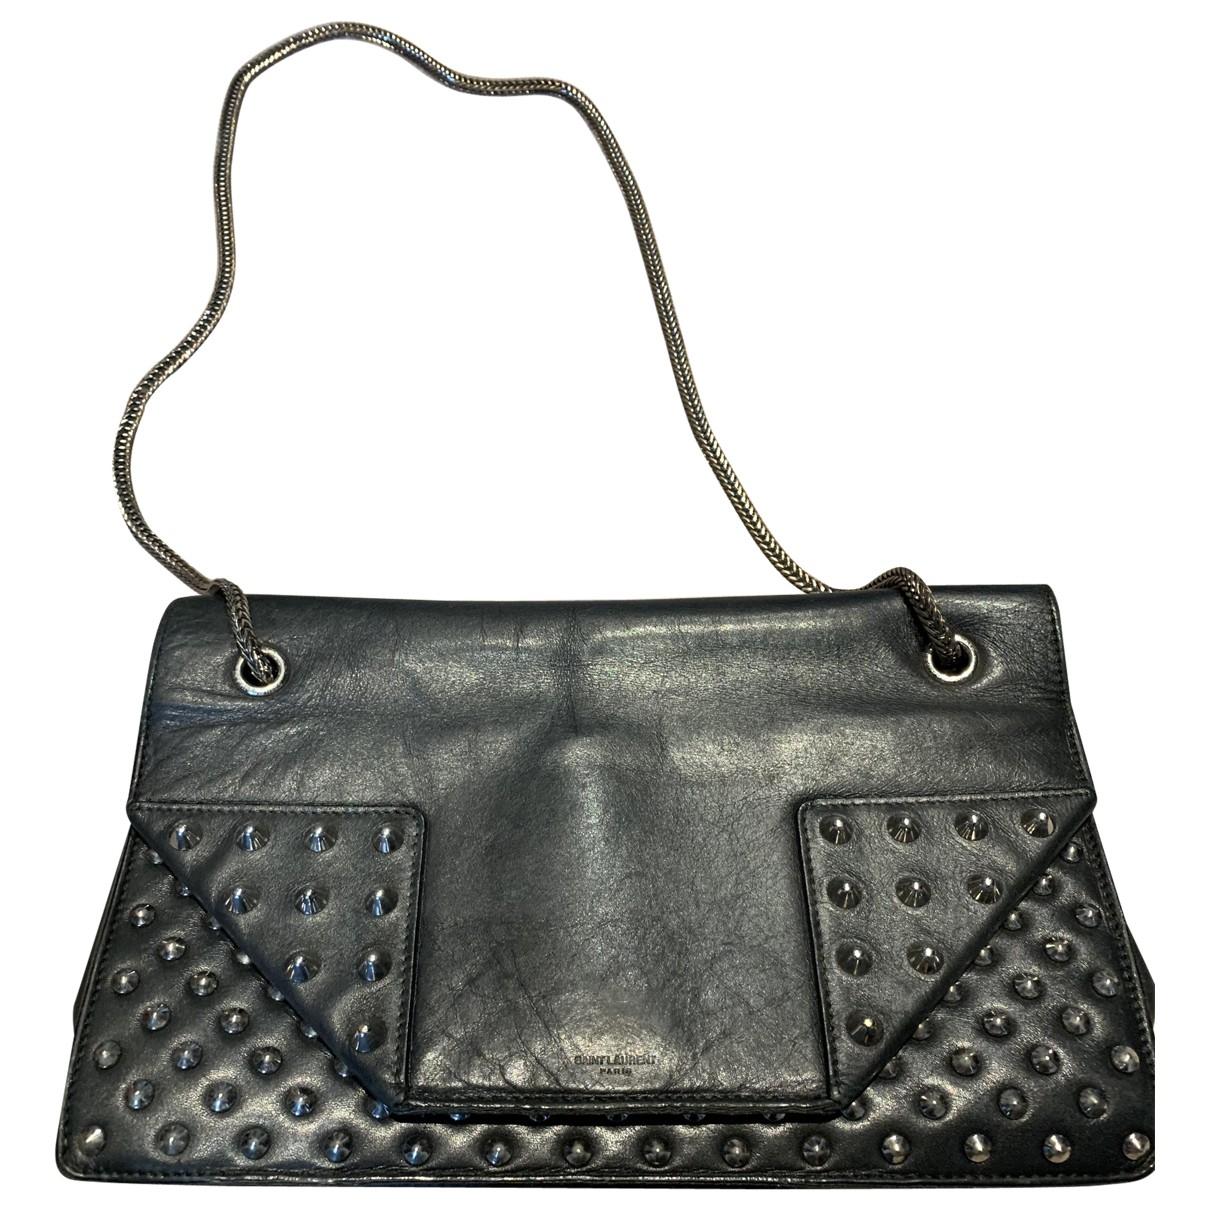 Saint Laurent Betty Handtasche in  Schwarz Leder